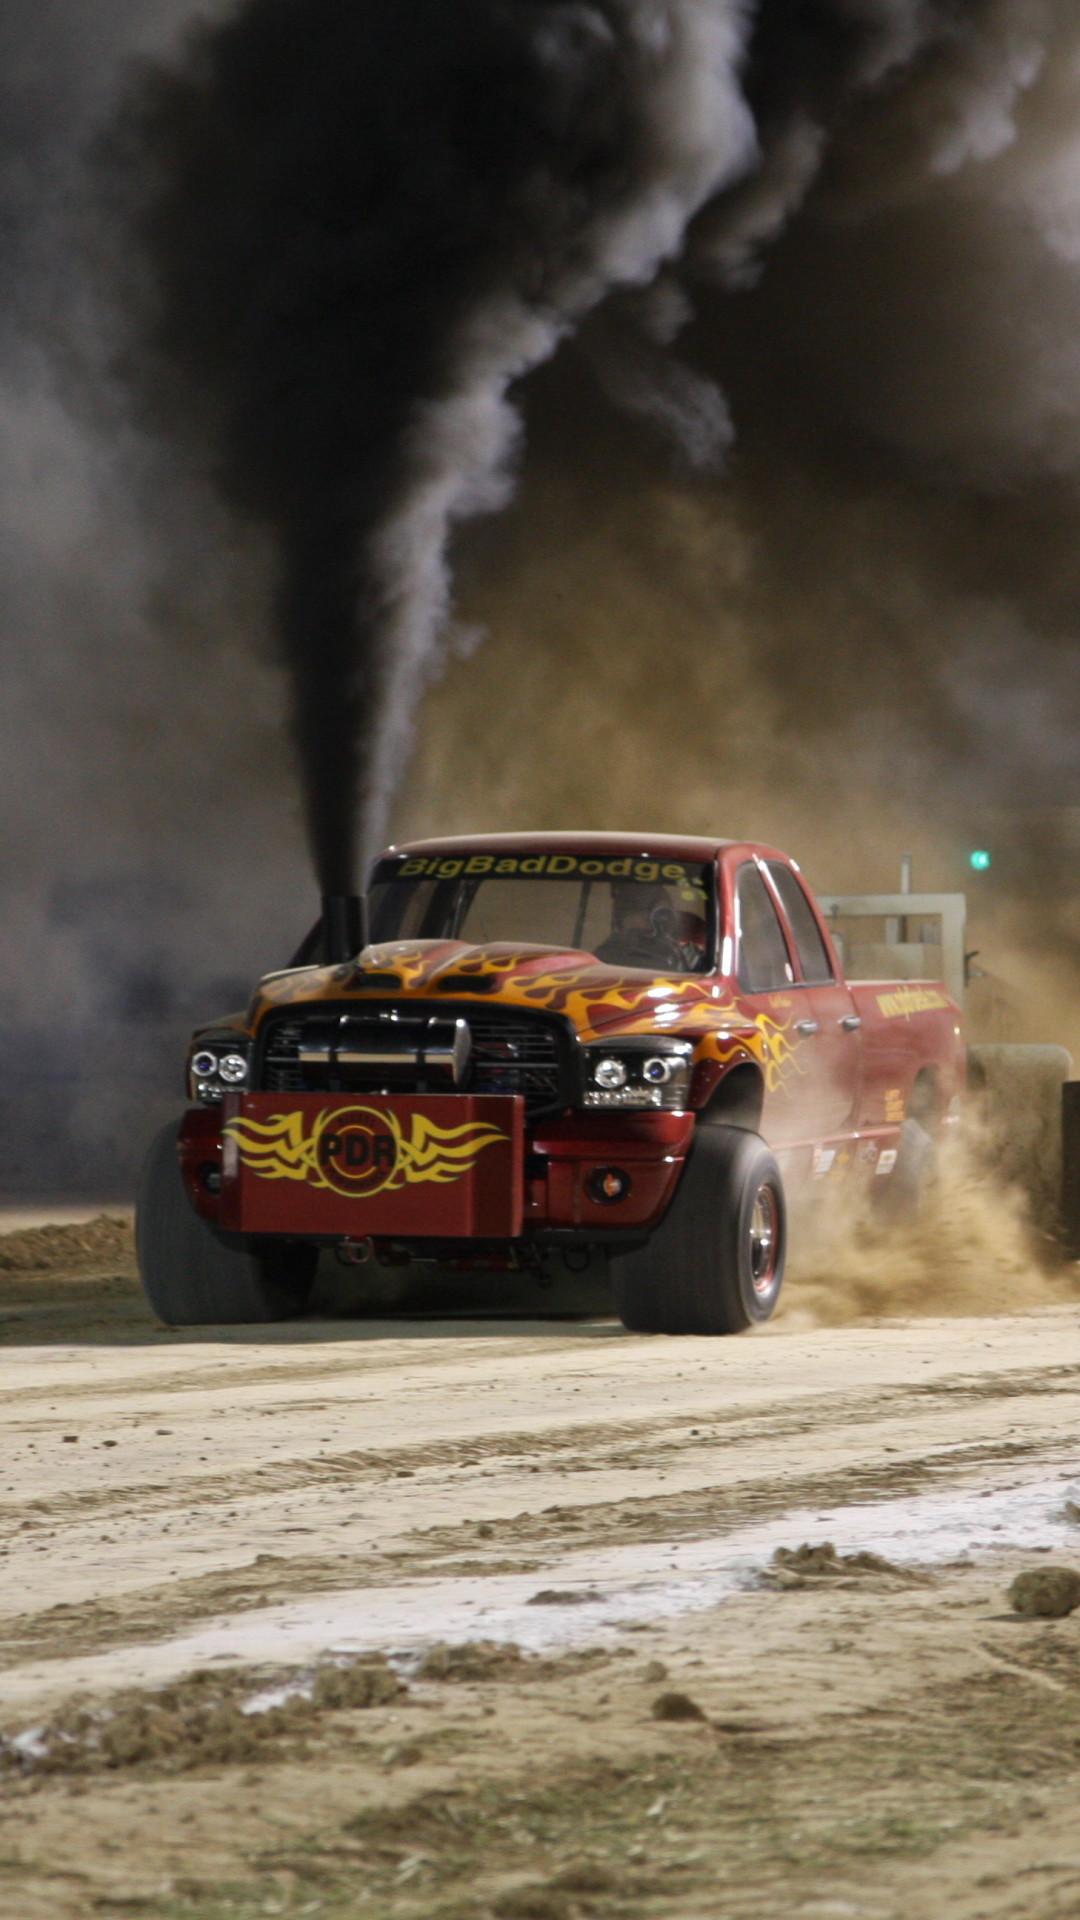 Diesel Truck Wallpaper (43+ images)